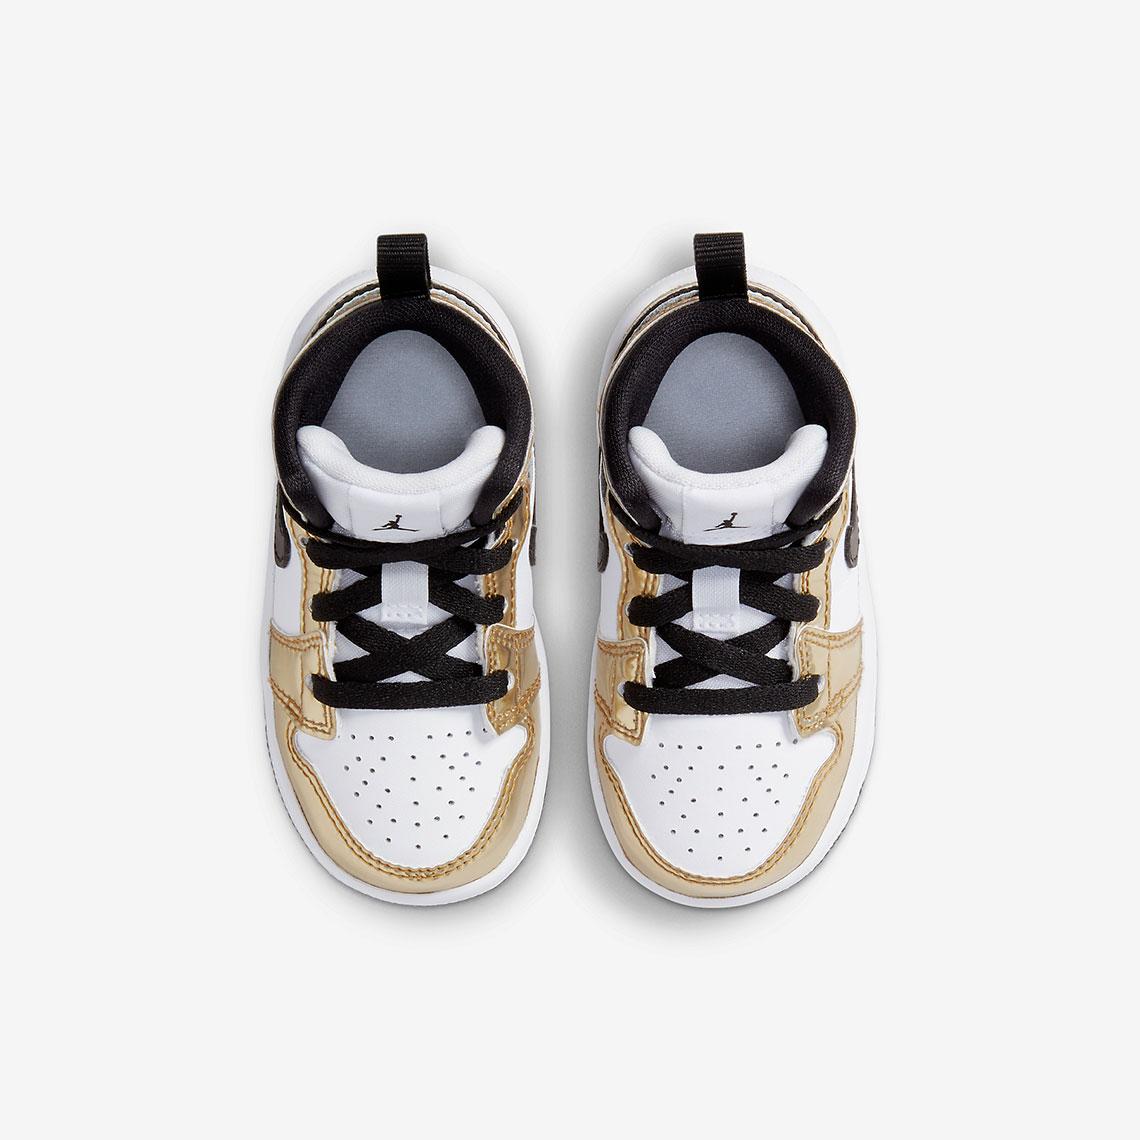 boys shoes for women Metallic Gold